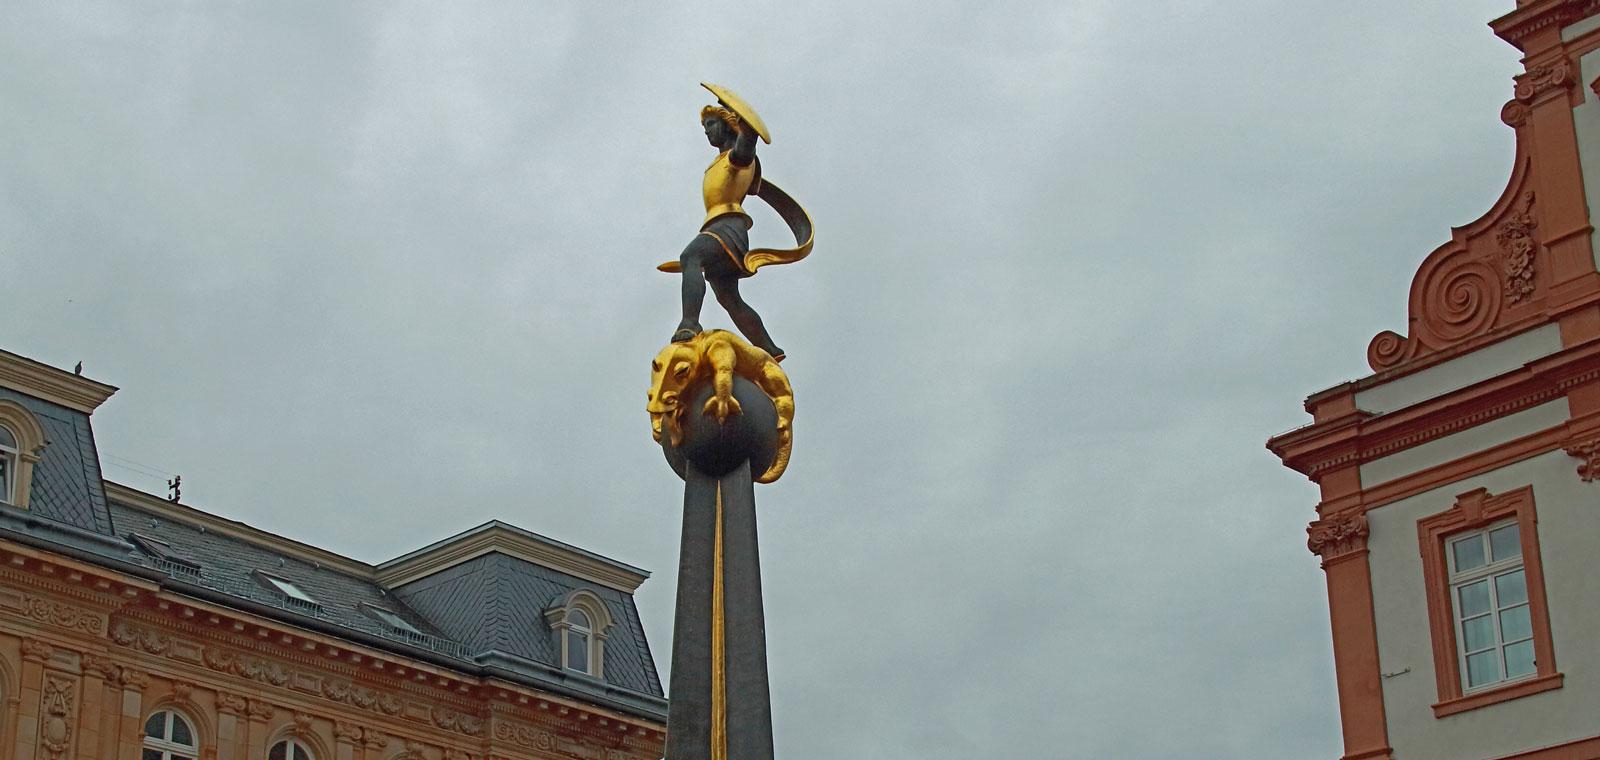 Rhine-13-08-14_17-29-20